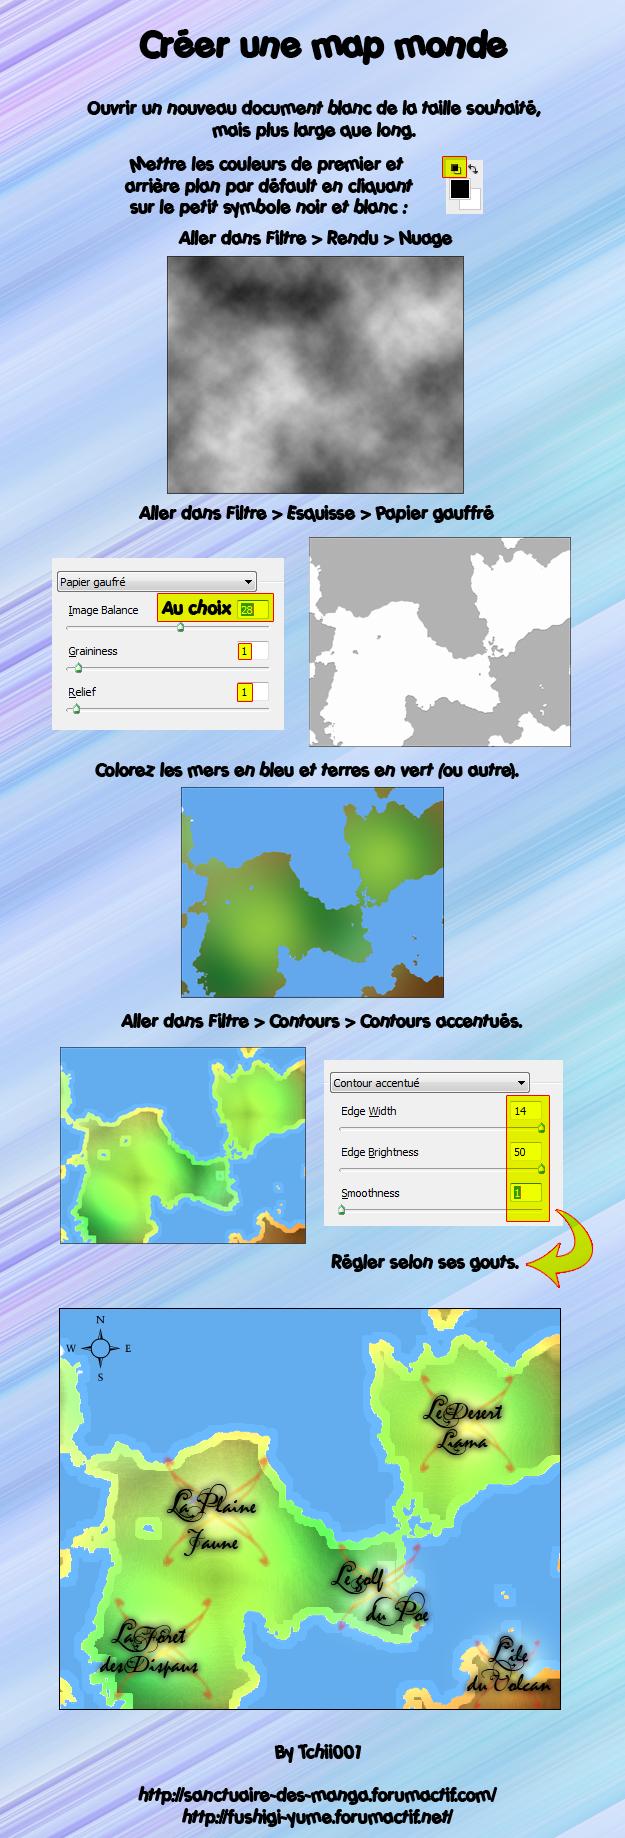 Créer une map monde Creer_une_map_monde_by_Tchii001